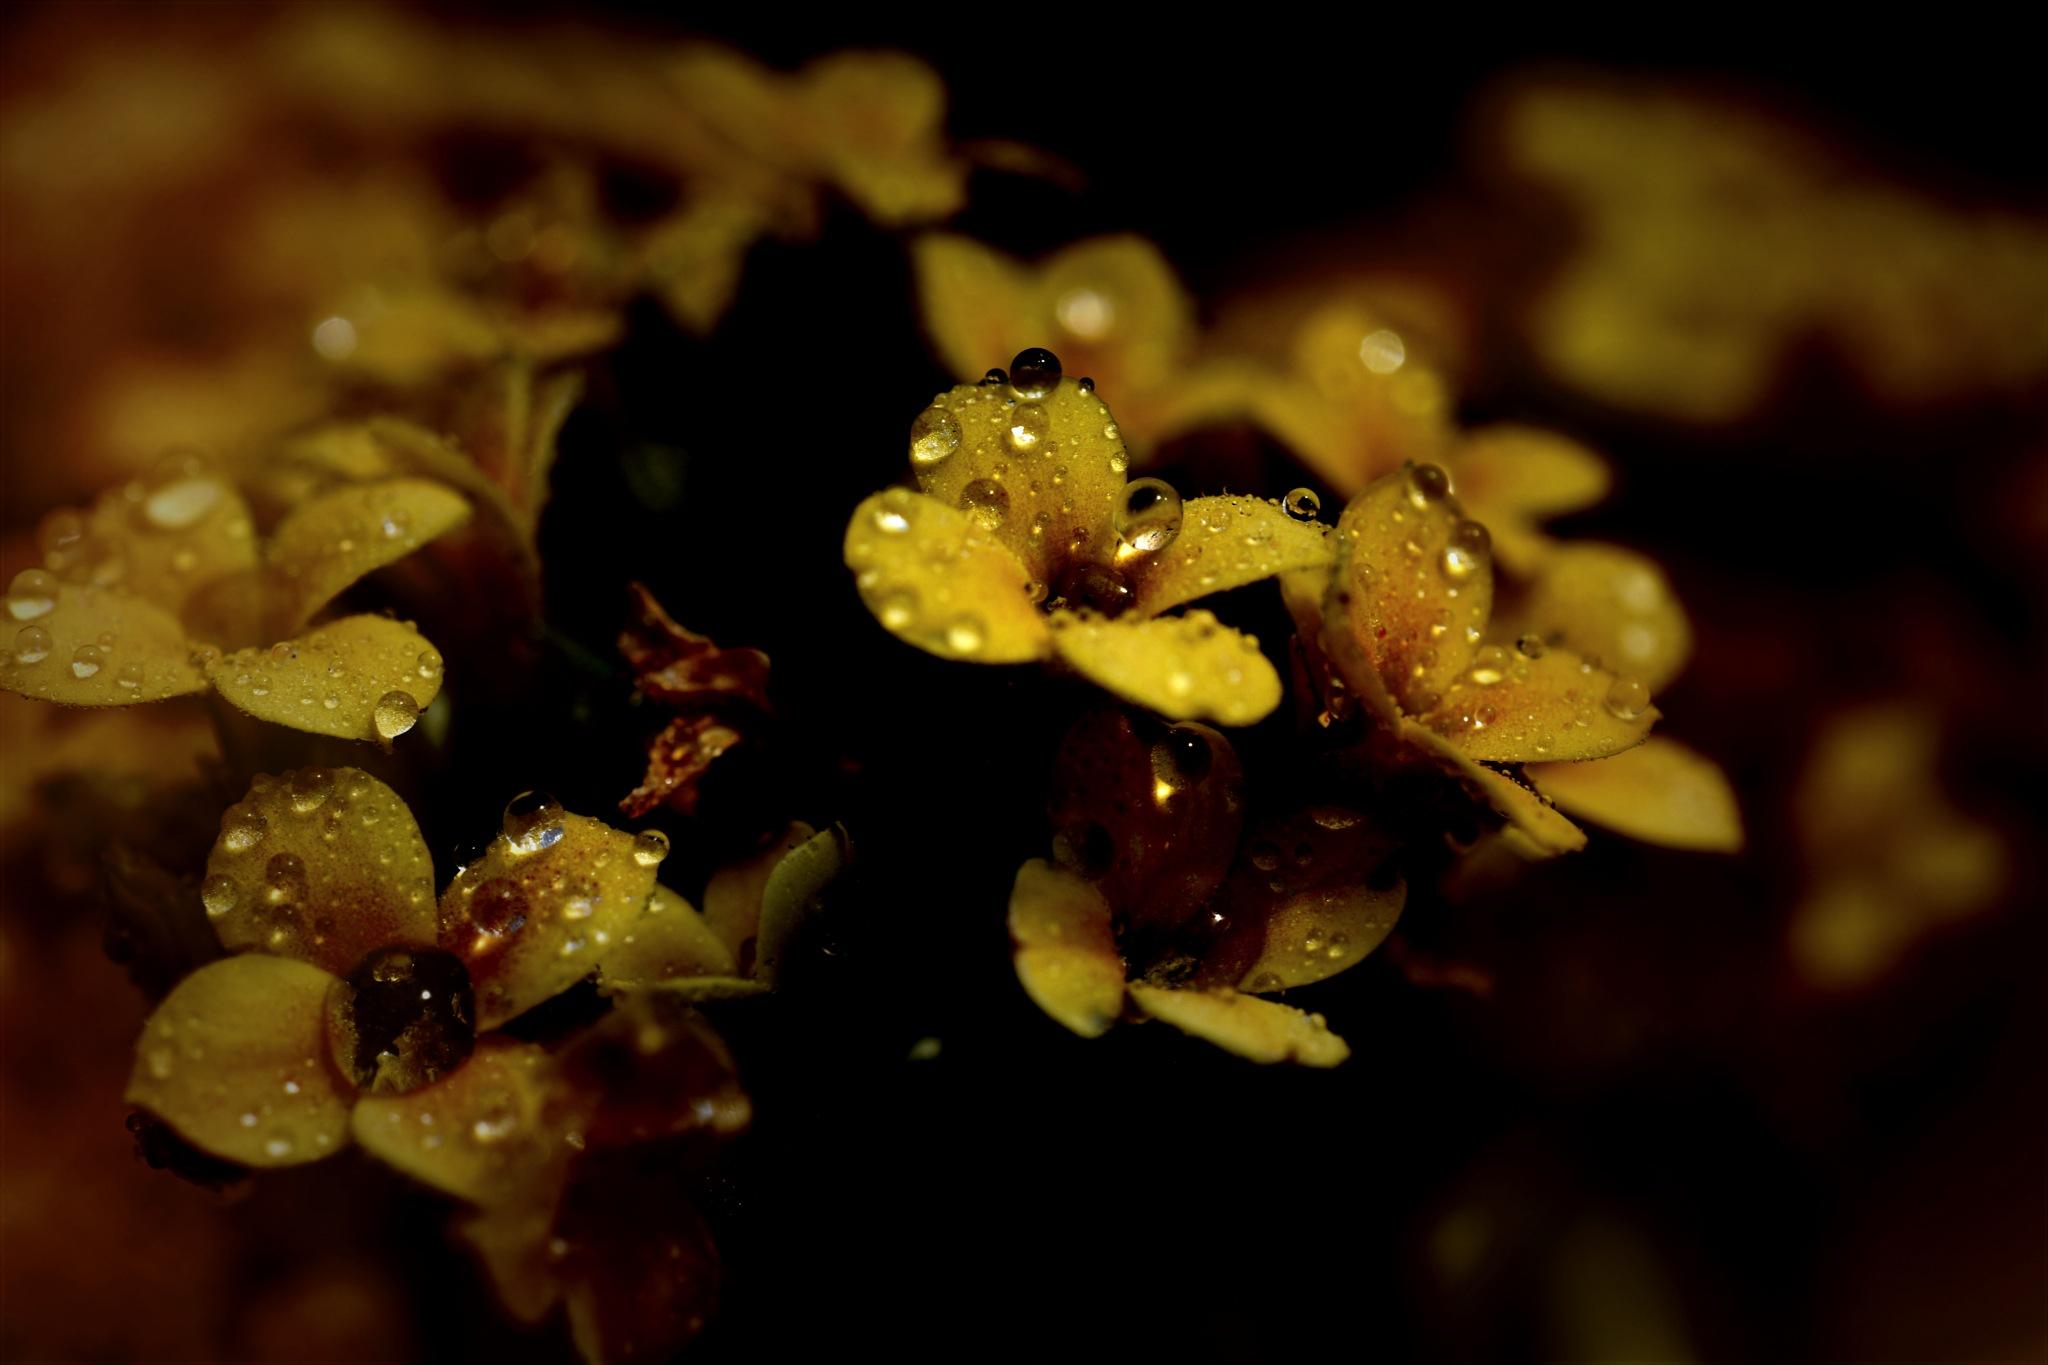 wildflower 002 by pgavin5000